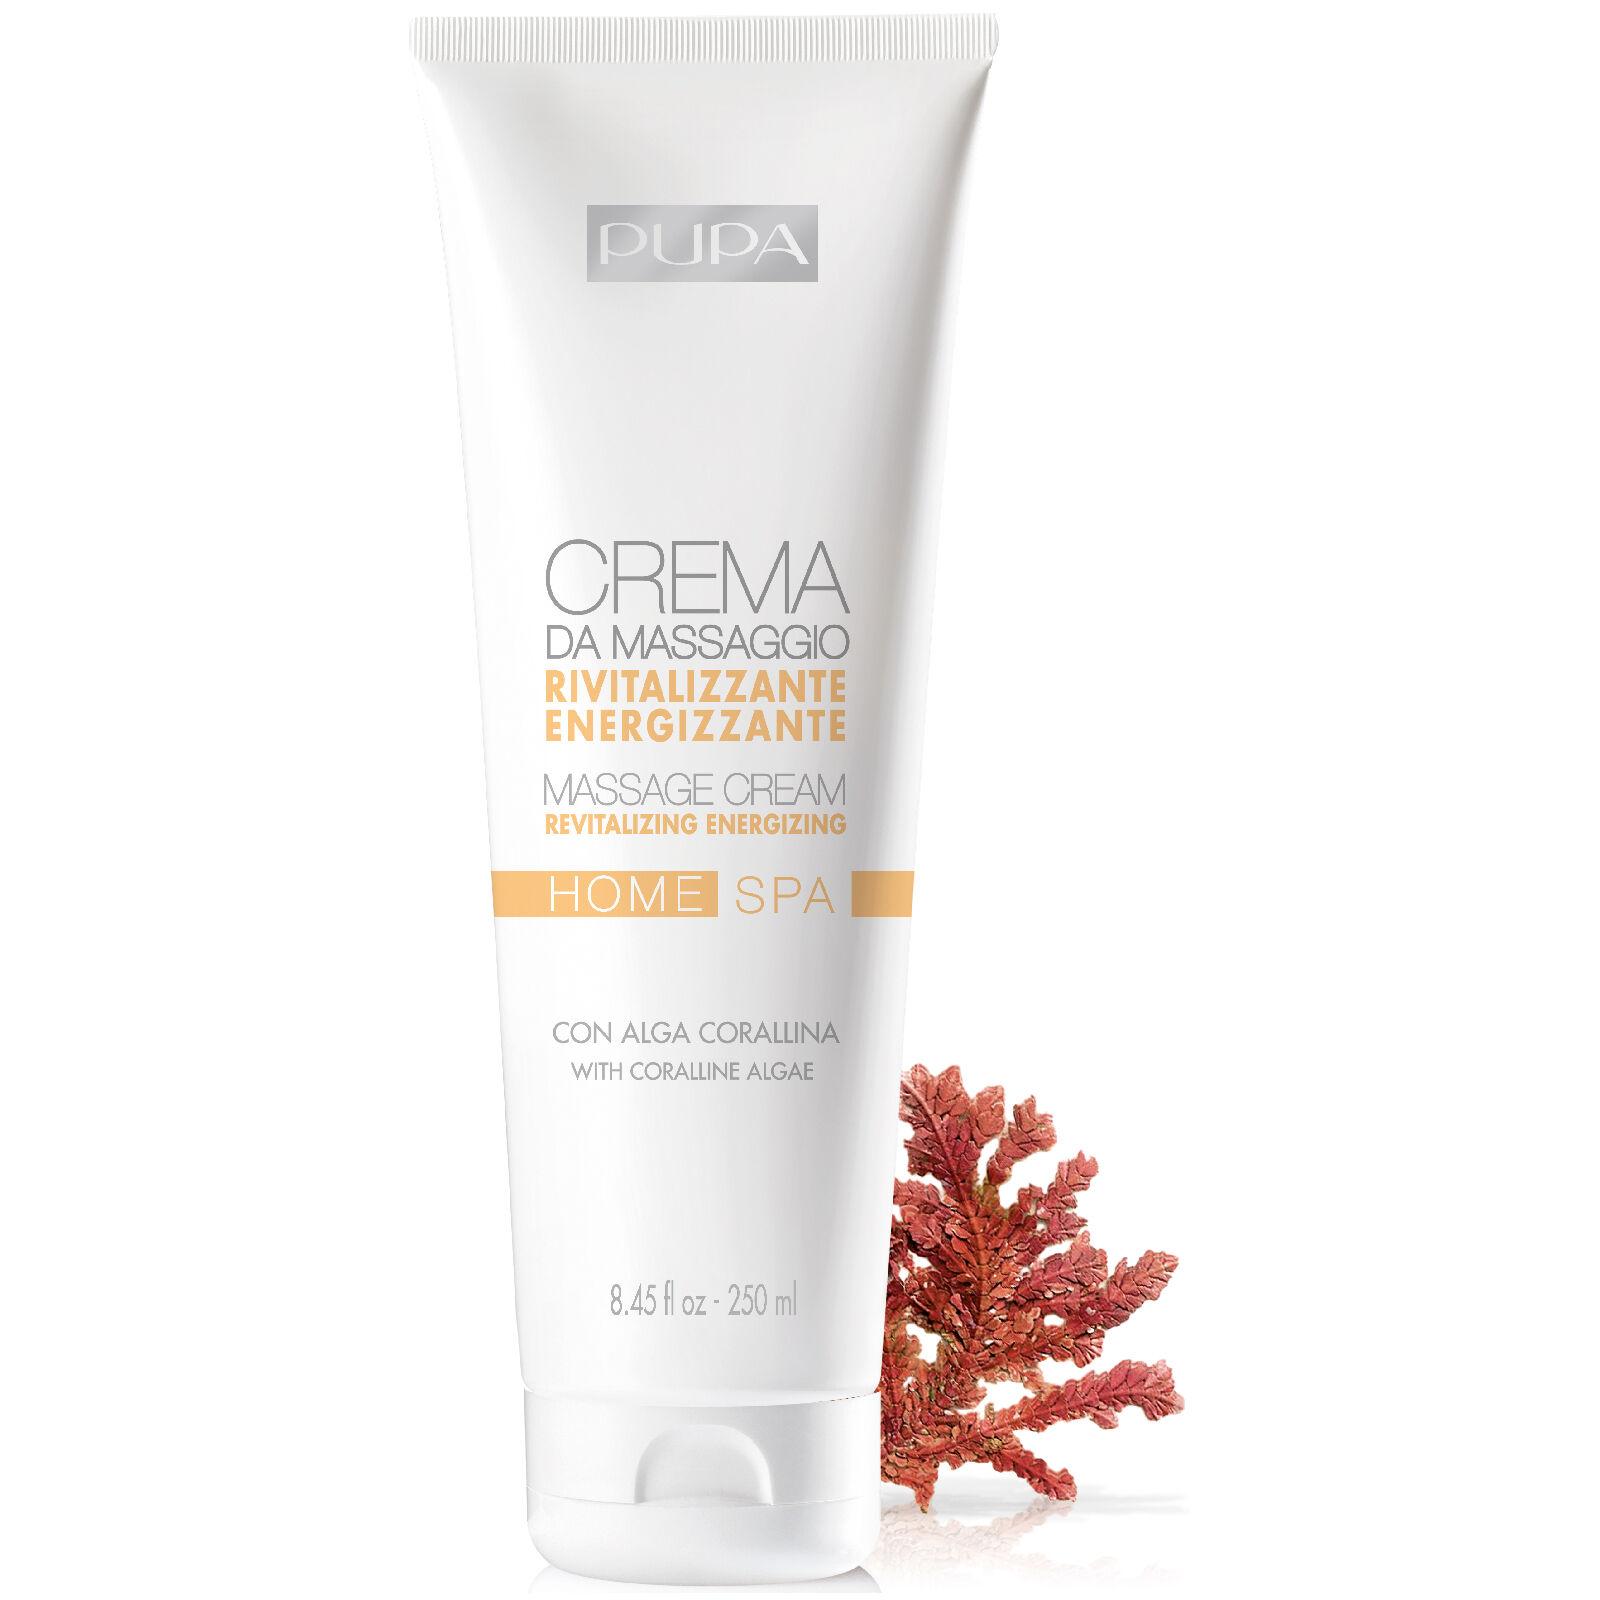 PUPA Home Spa Massage Cream - Revitalising 250ml